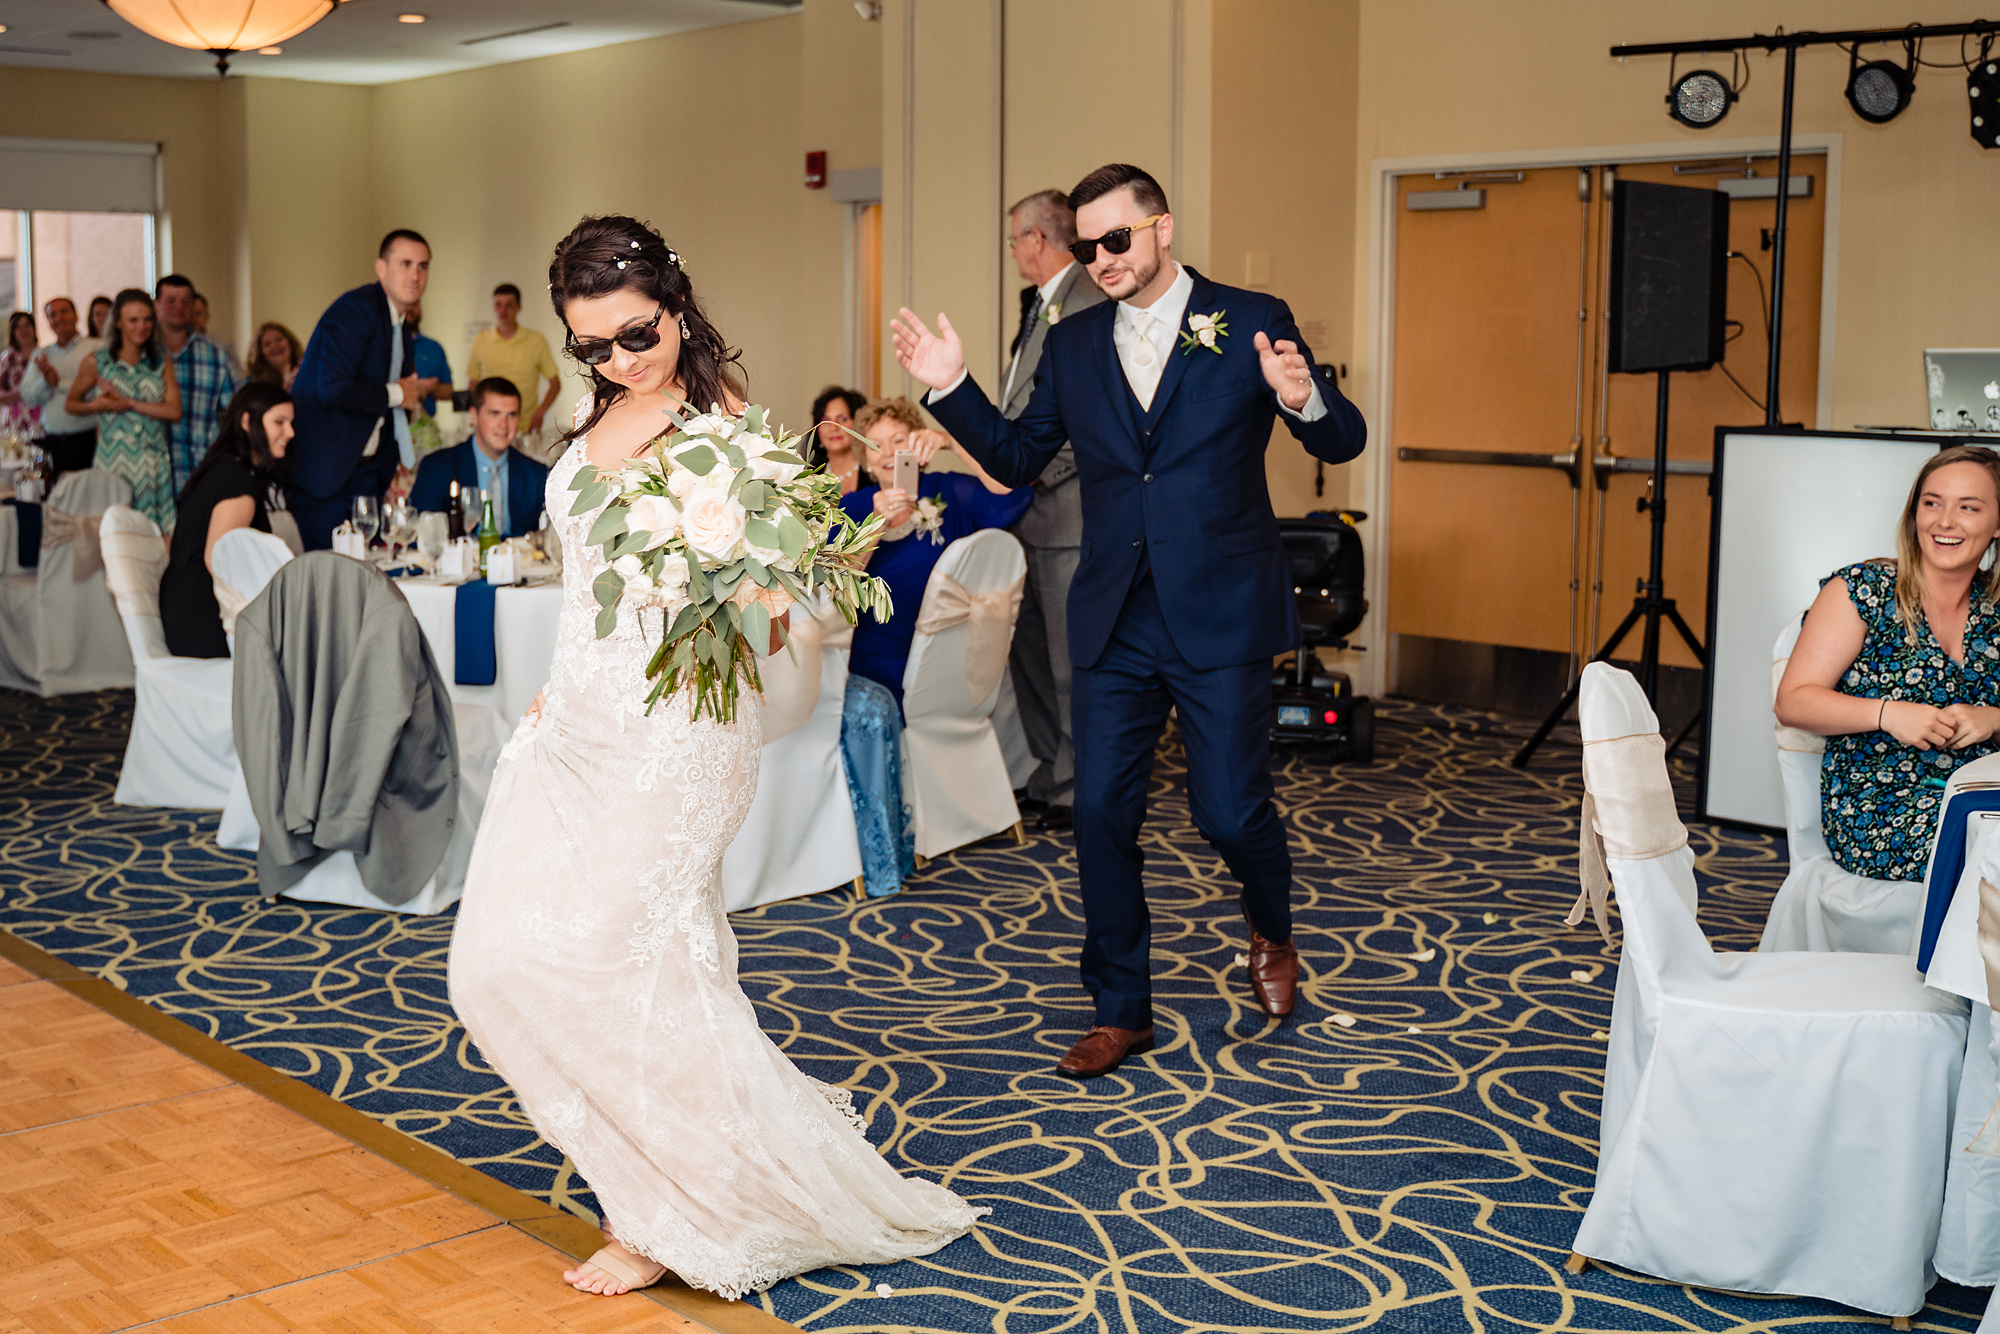 Embassy-Suites-Rivercenter-Wedding-Photography-28.jpg